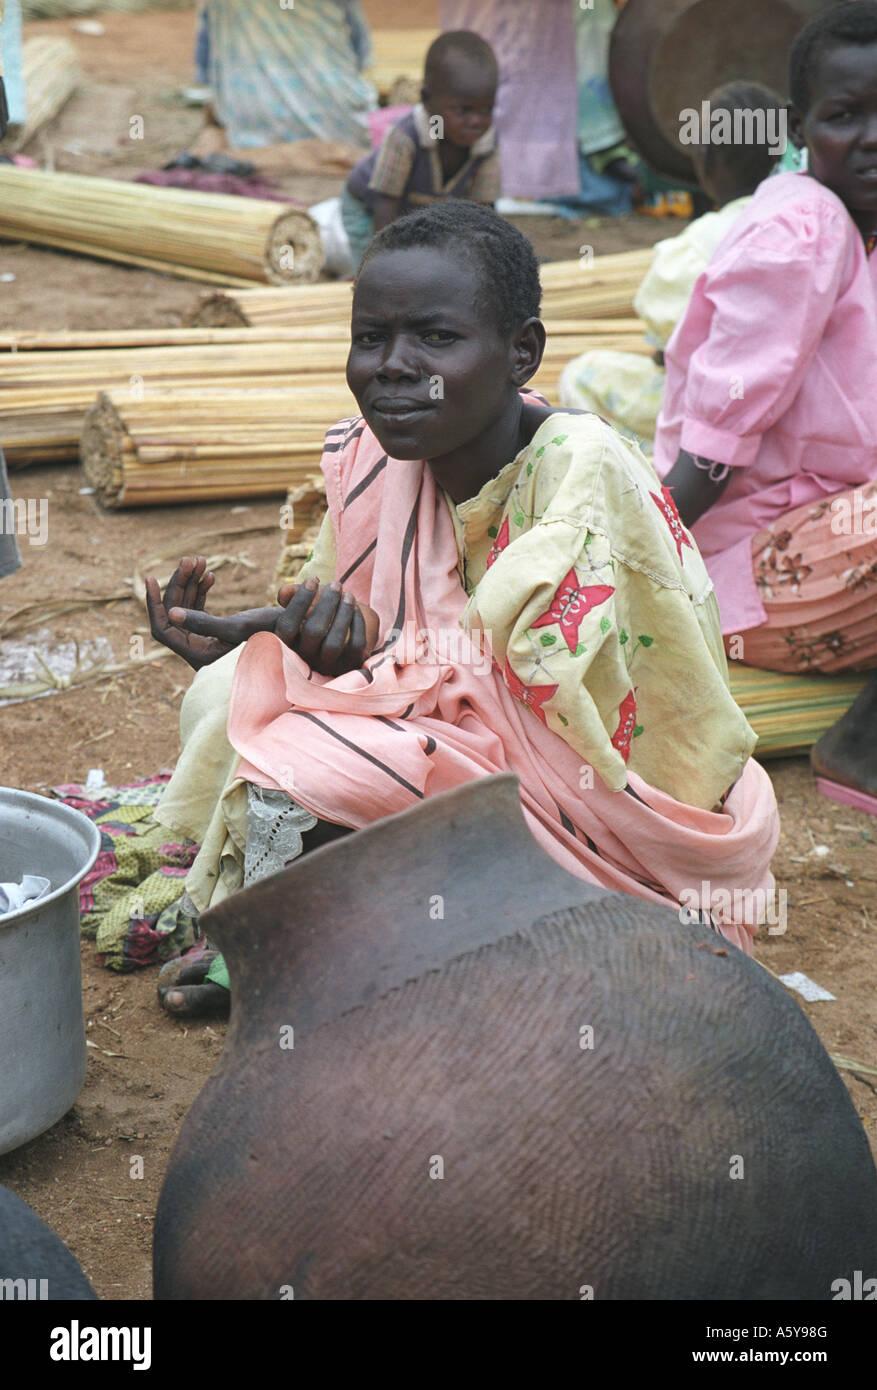 Woman at Juba market, South Sudan - Stock Image